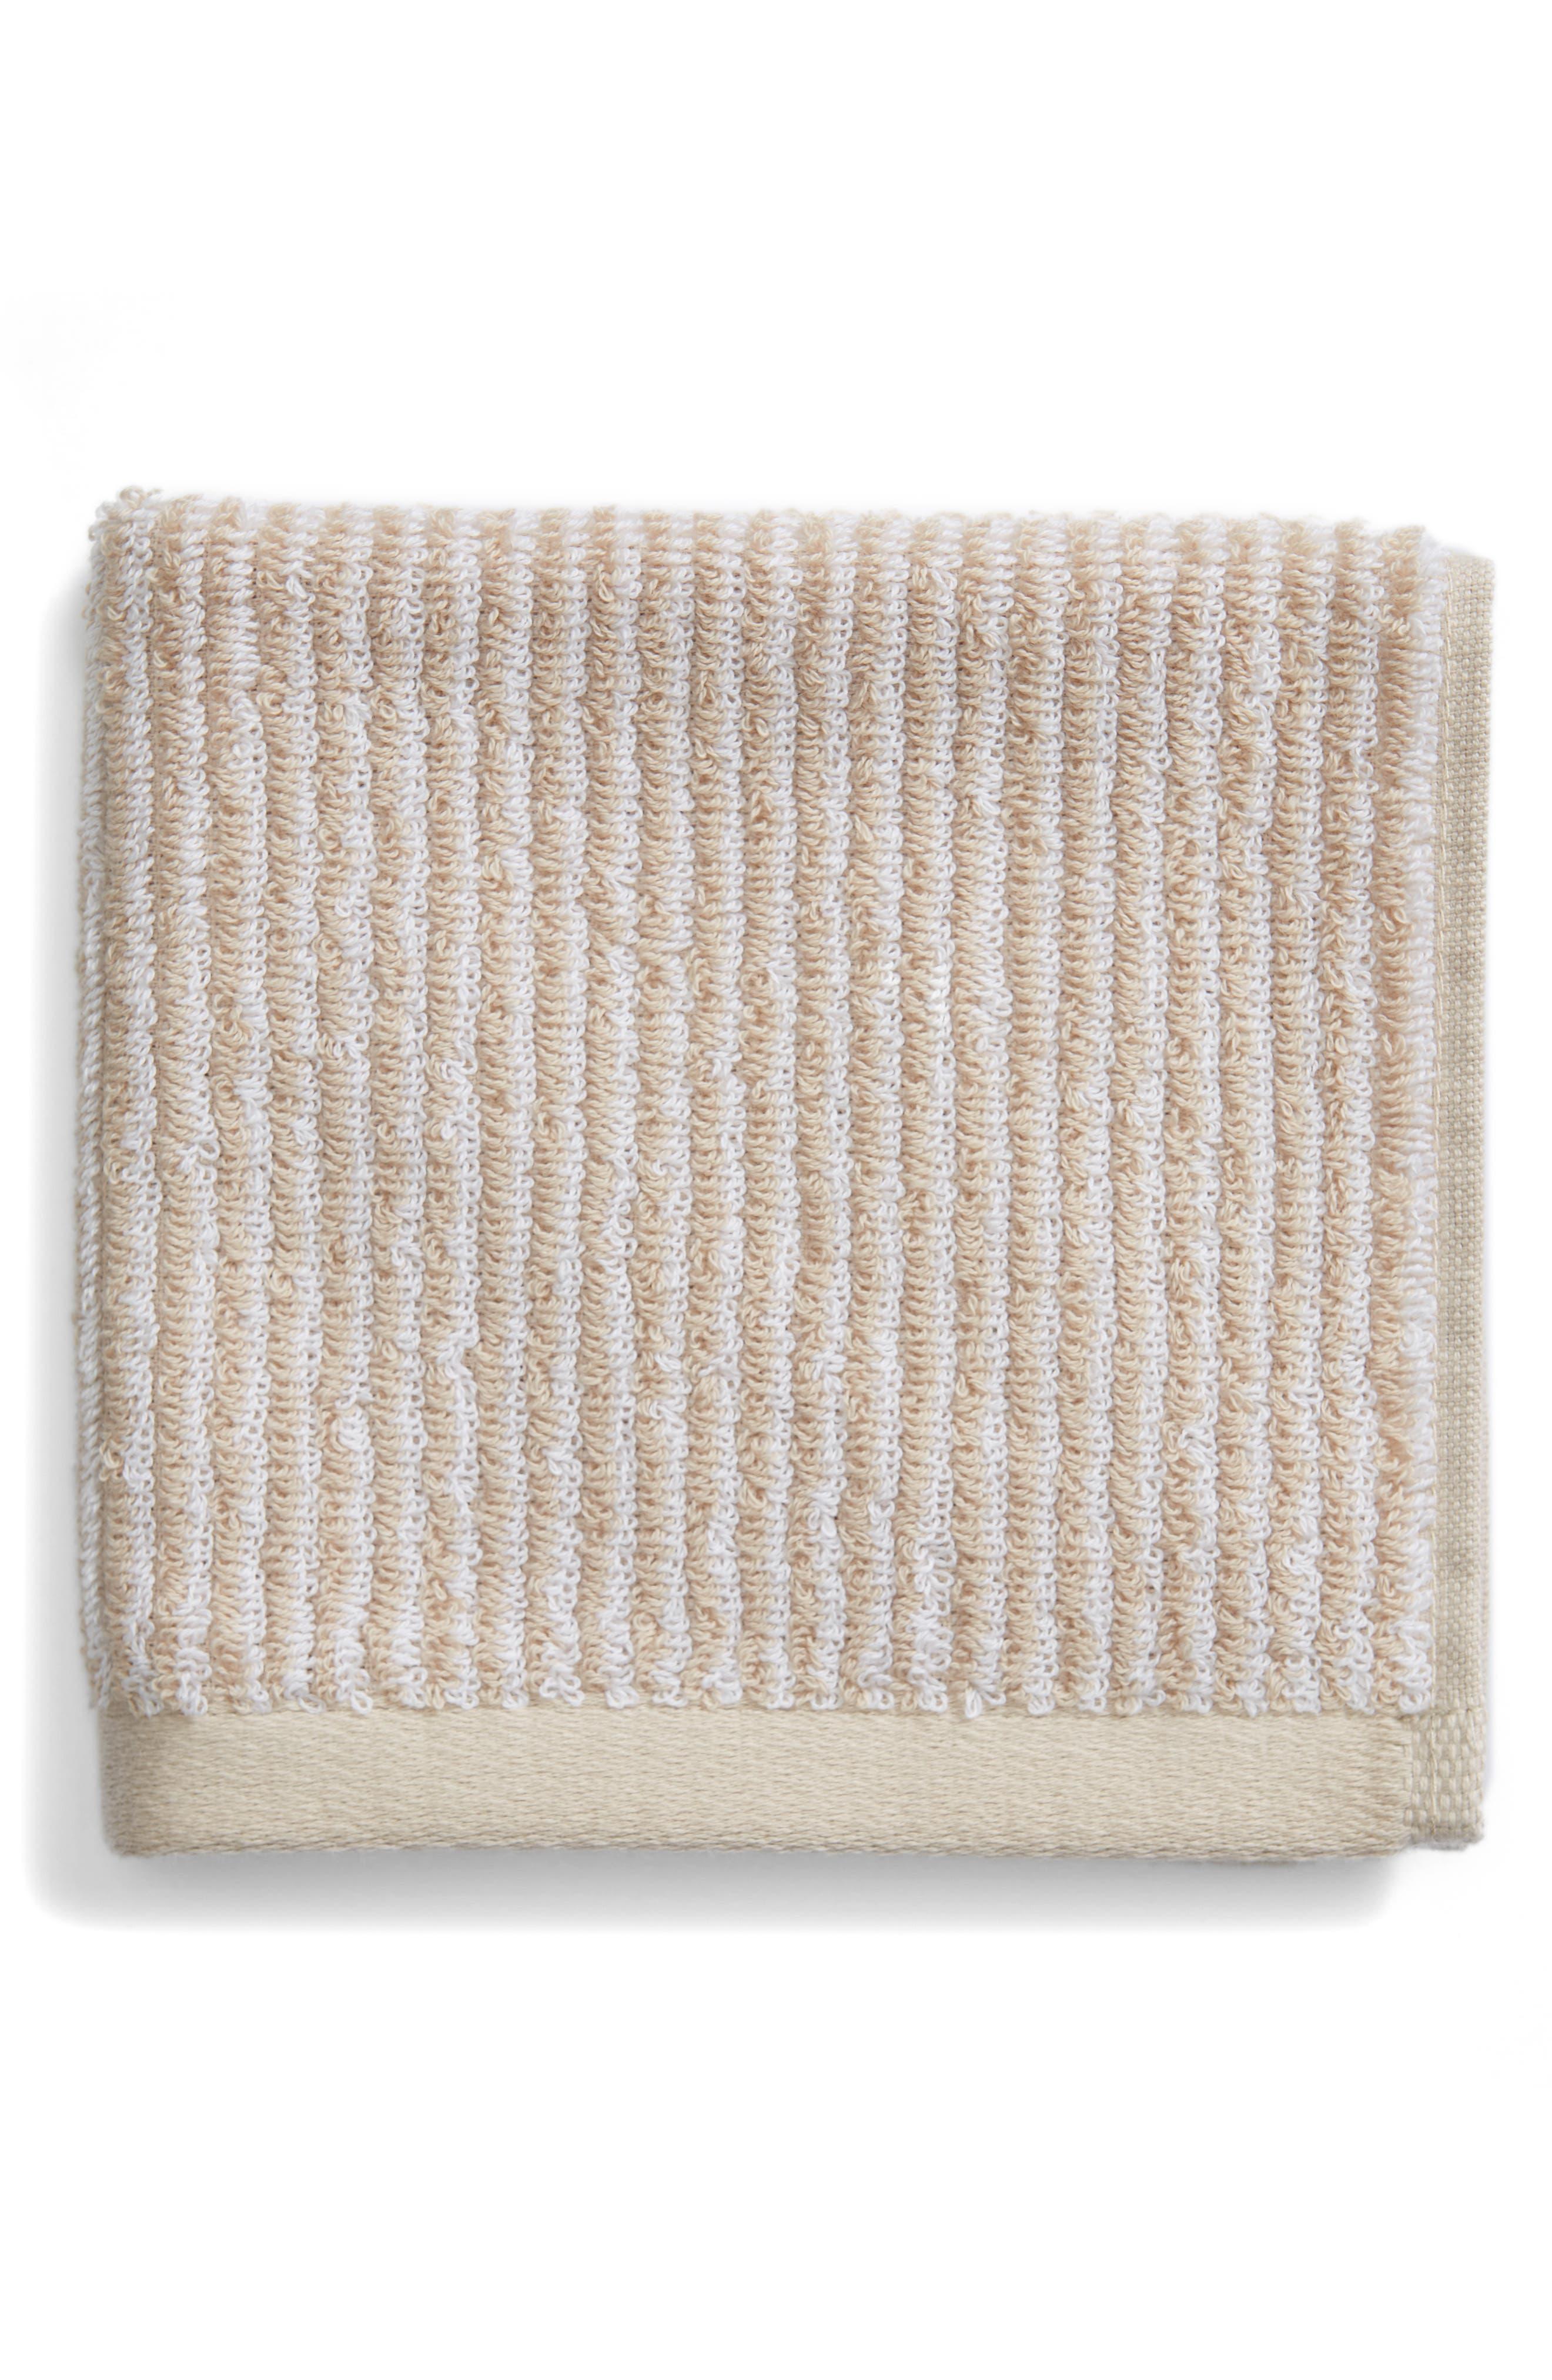 Nordstrom at Home Ezra Stripe Washcloth